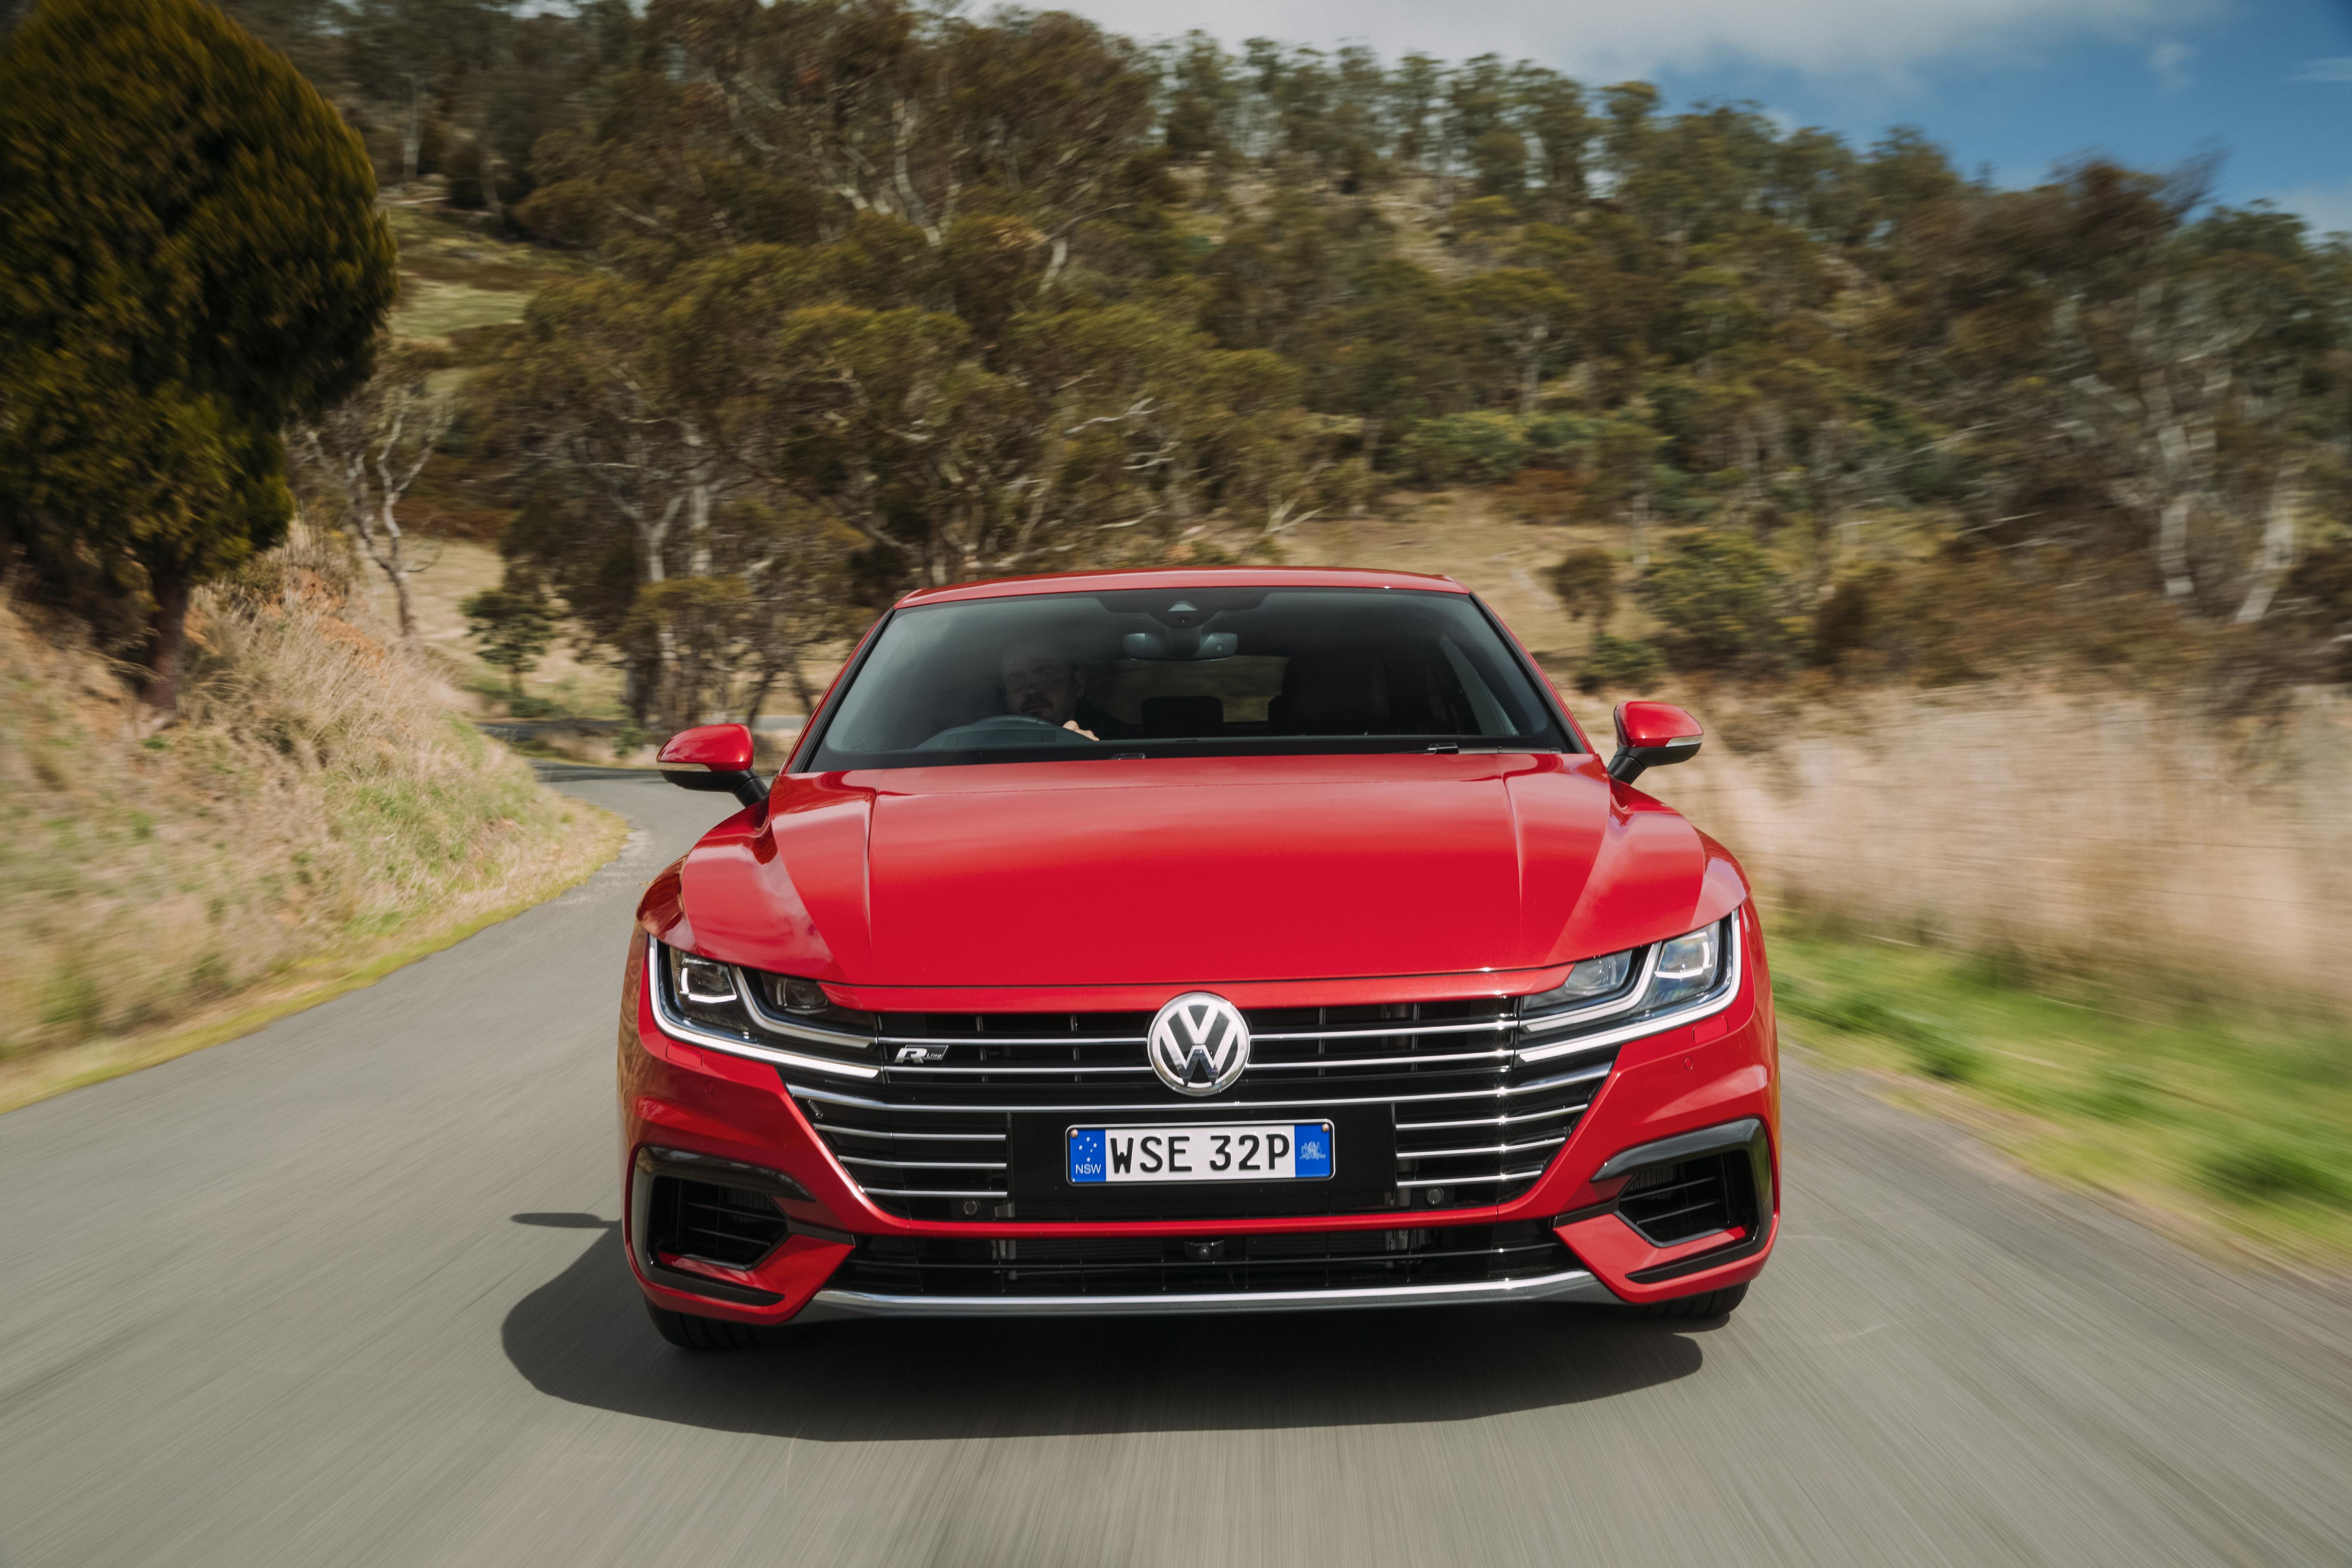 2017 Volkswagen Arteon first drive review